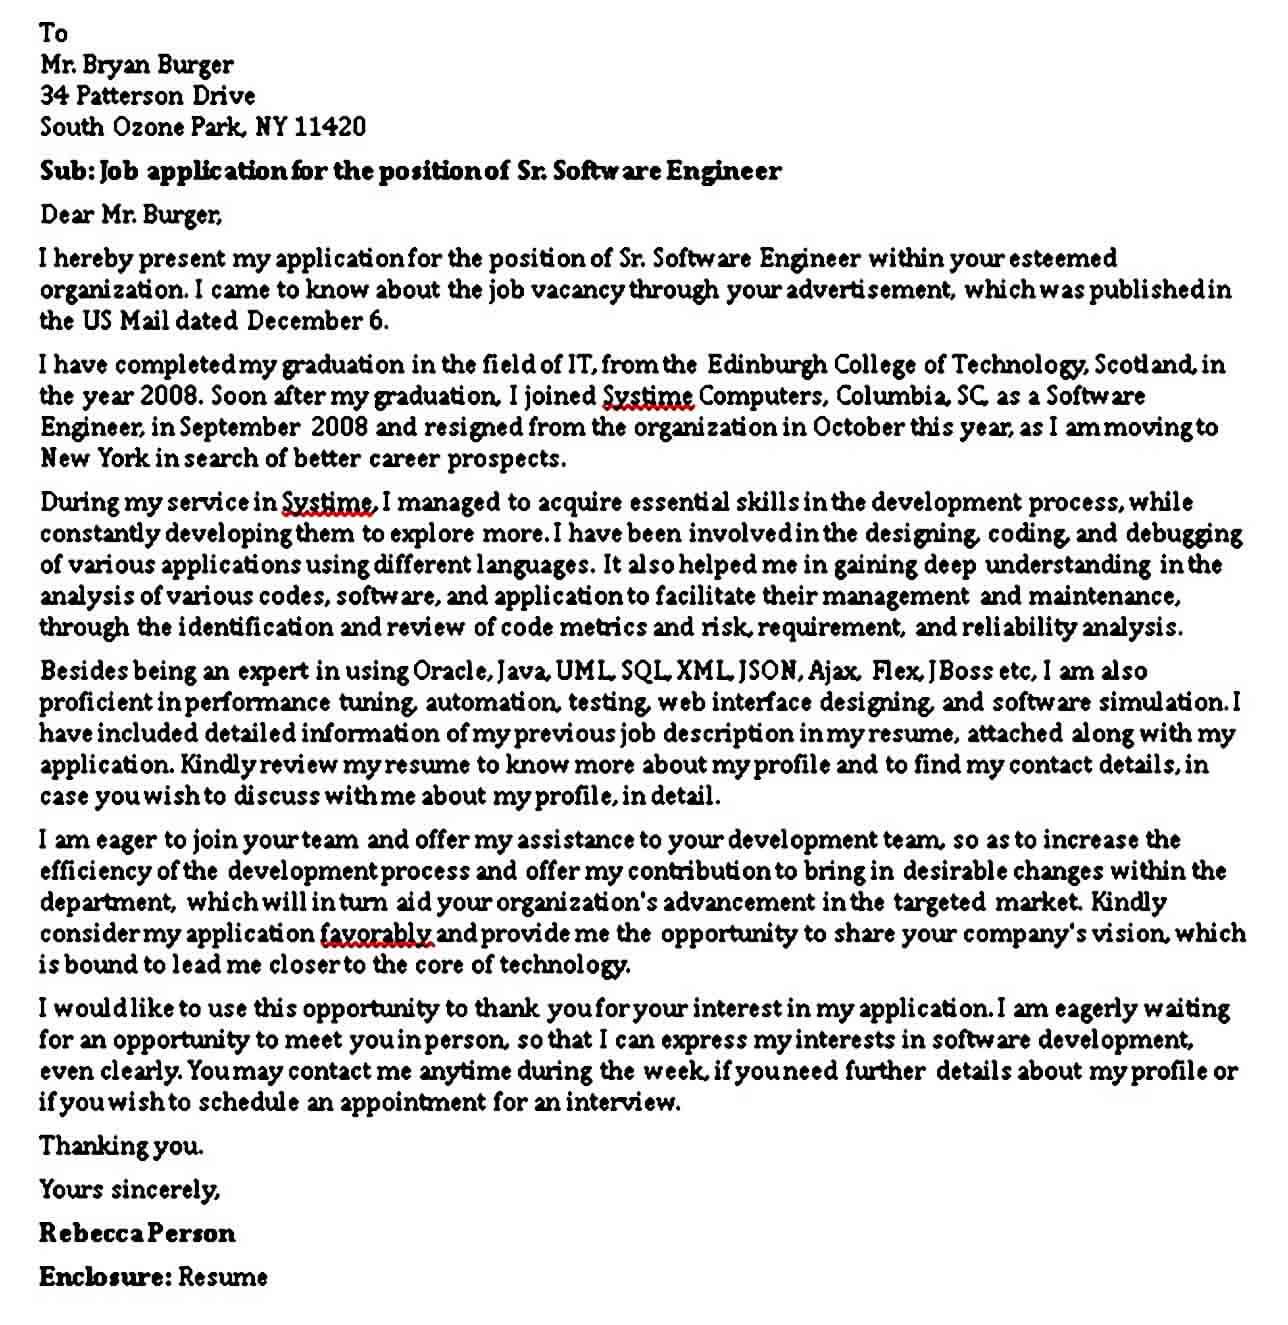 Senior Software Engineer Cover Letter